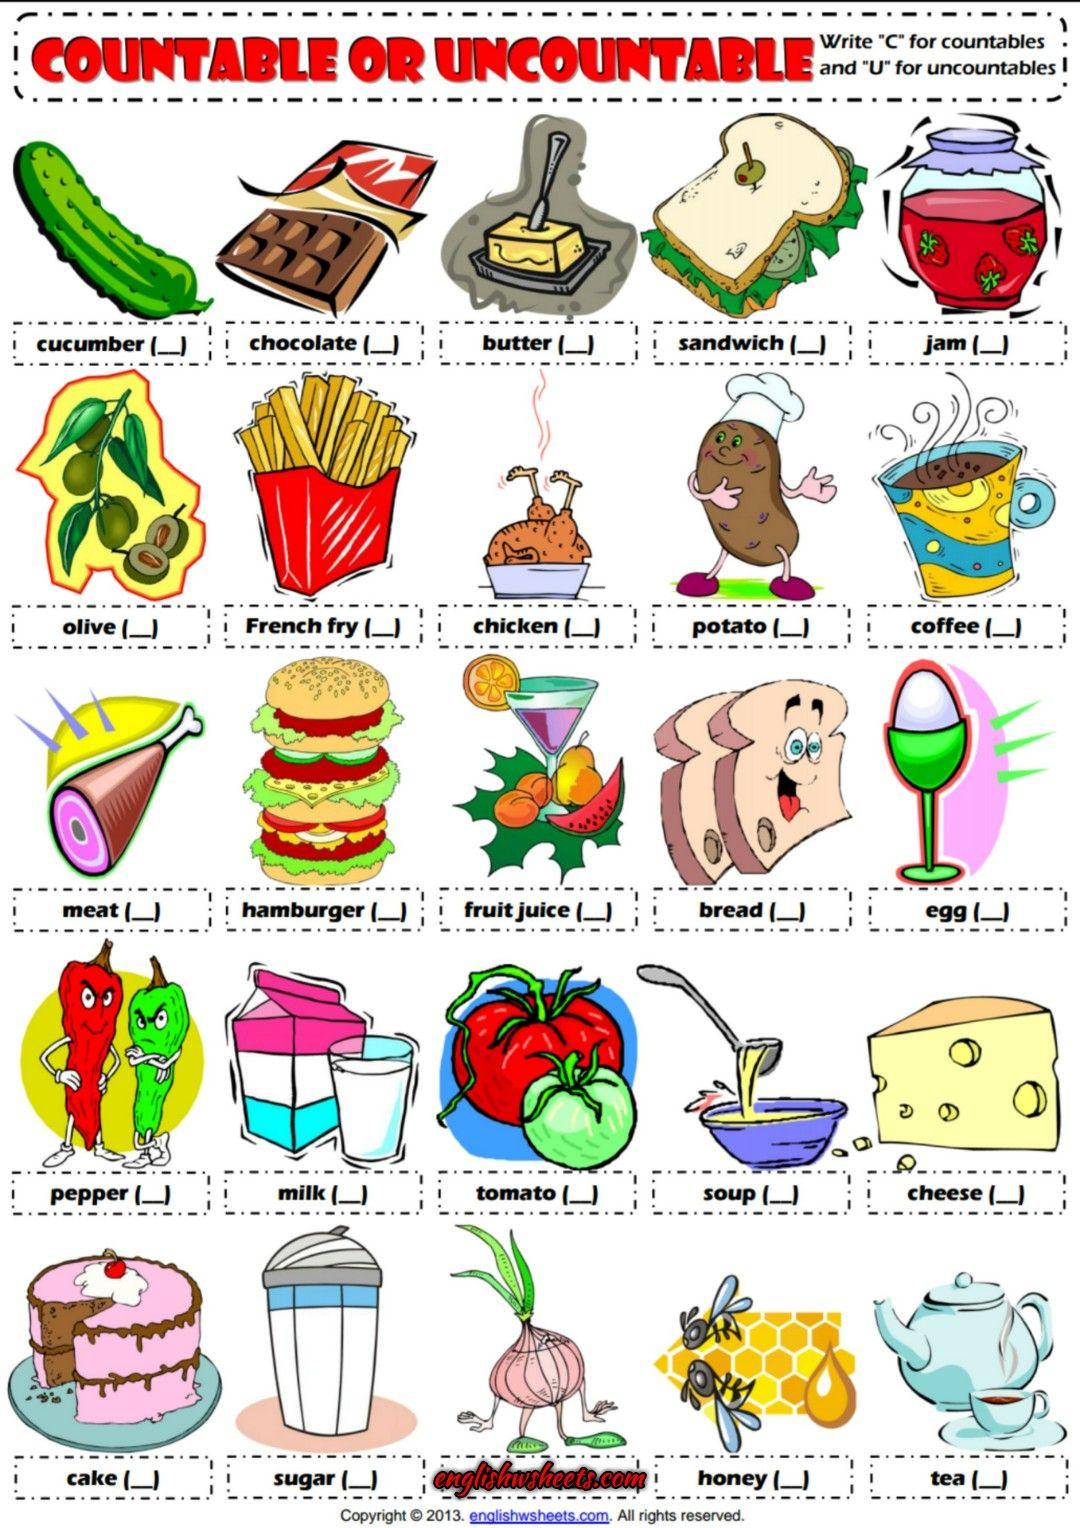 Countable Or Uncountable Nouns Esl Exercises Worksheet English Language Teaching English Vocabulary Uncountable Nouns English worksheet countable noun